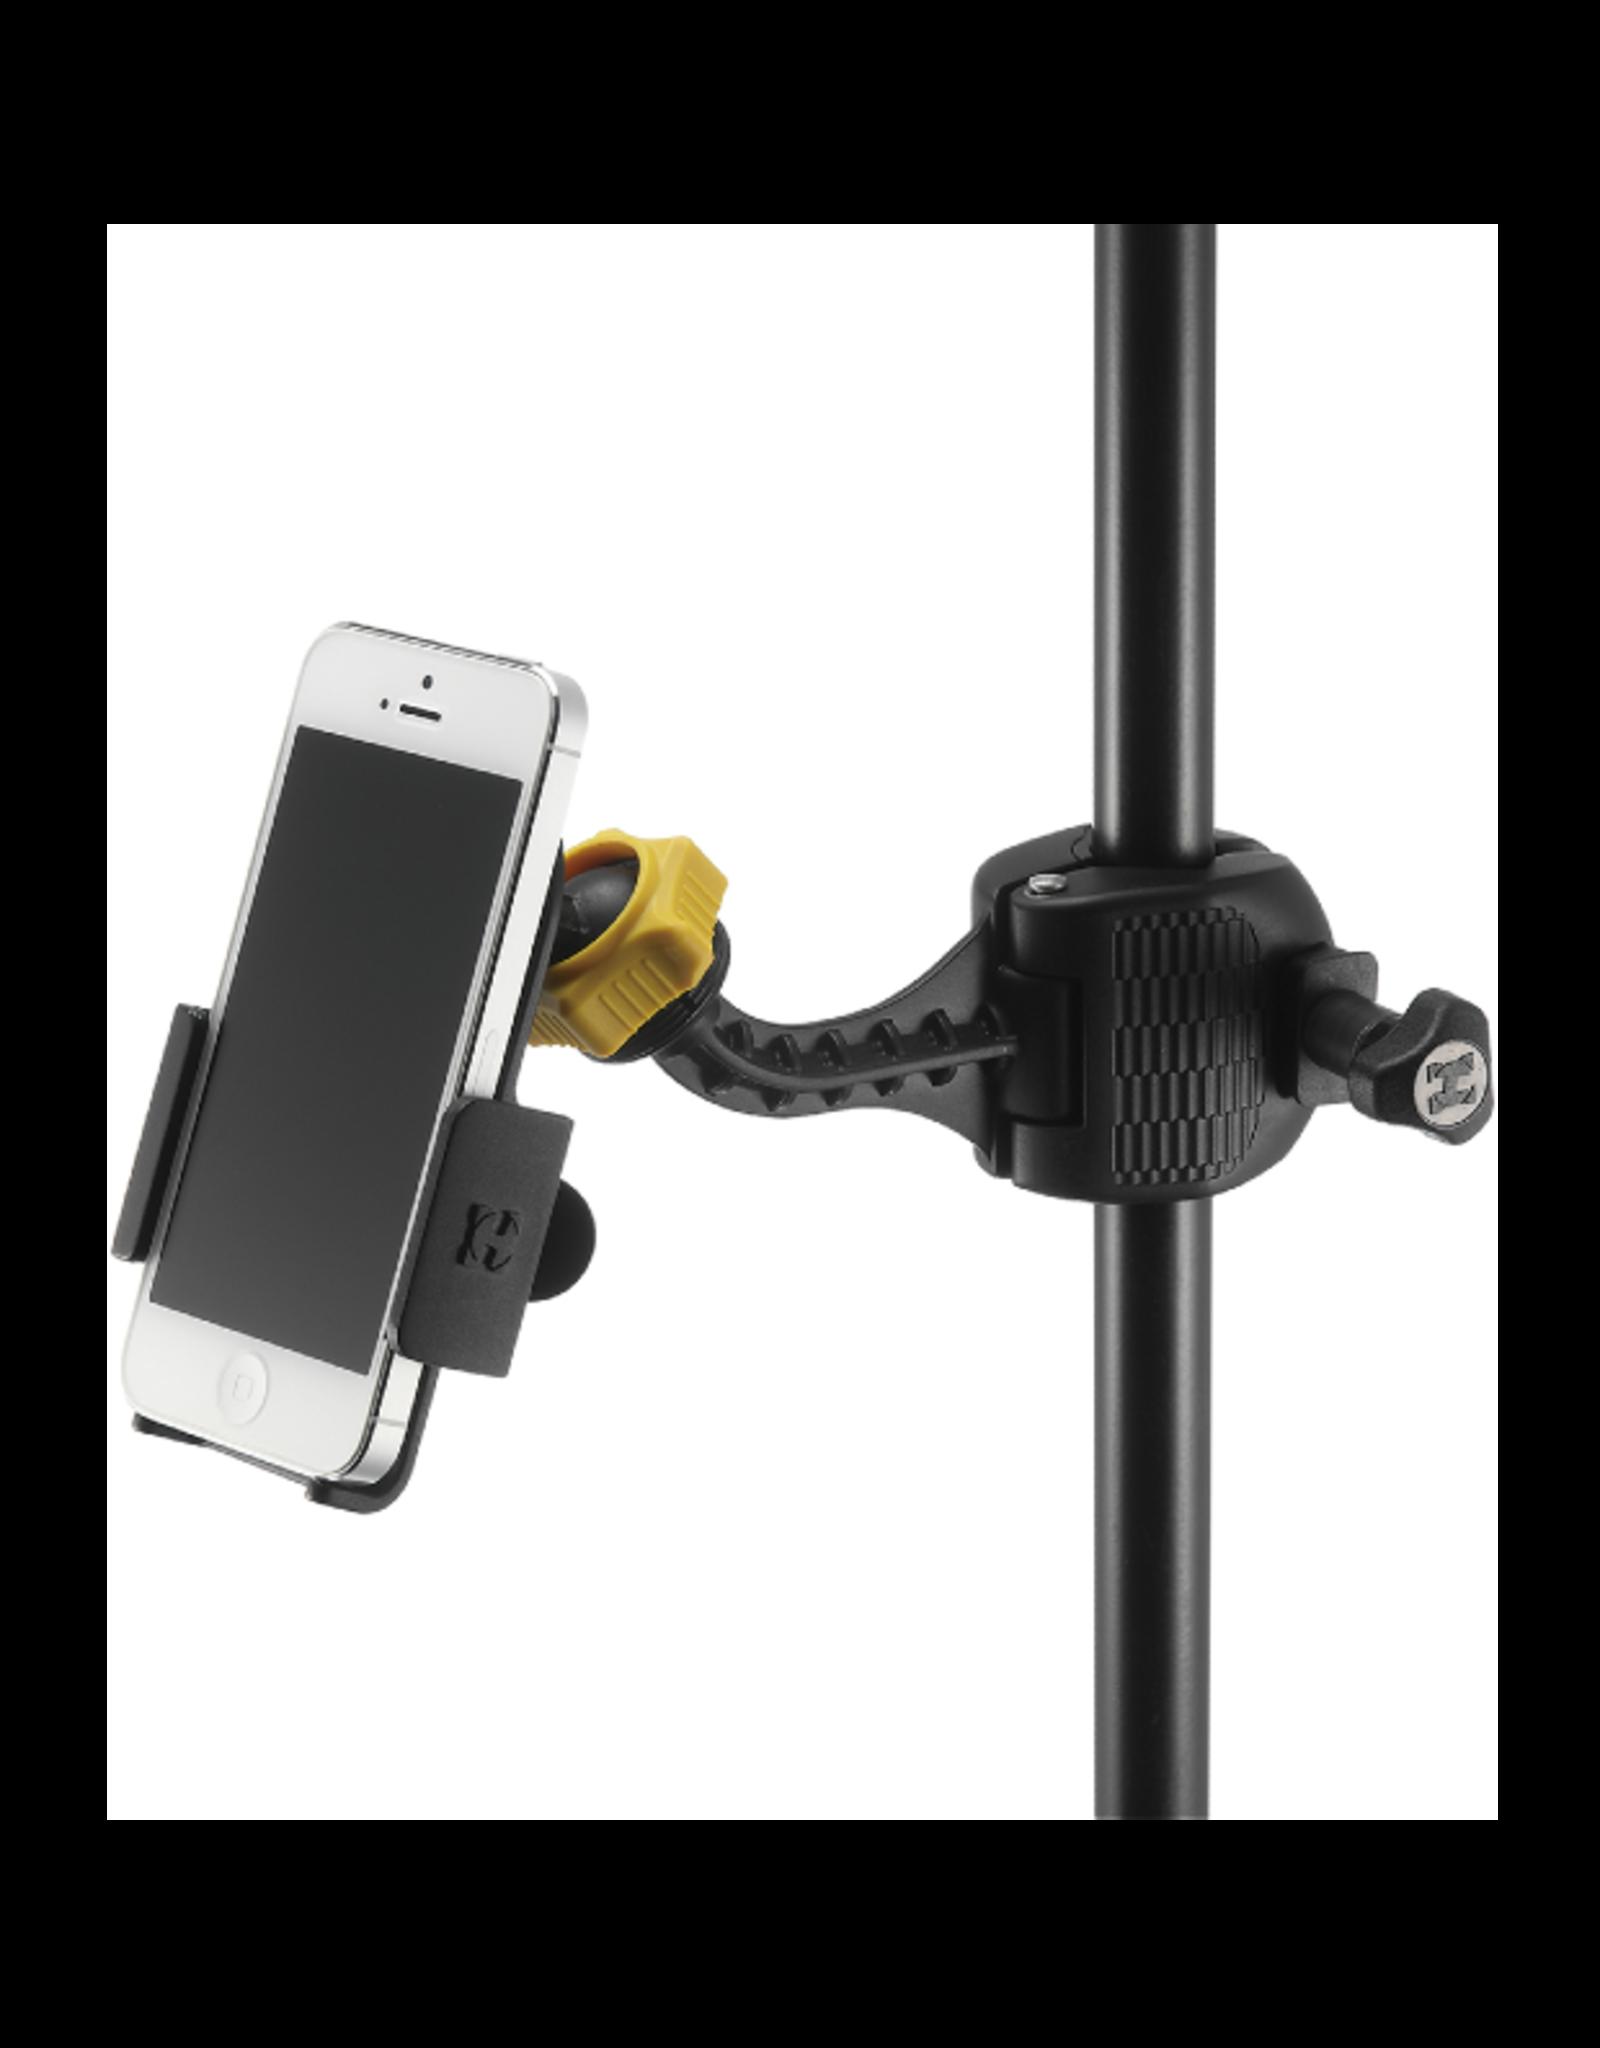 Hercules HERCULES Smartphone Holder